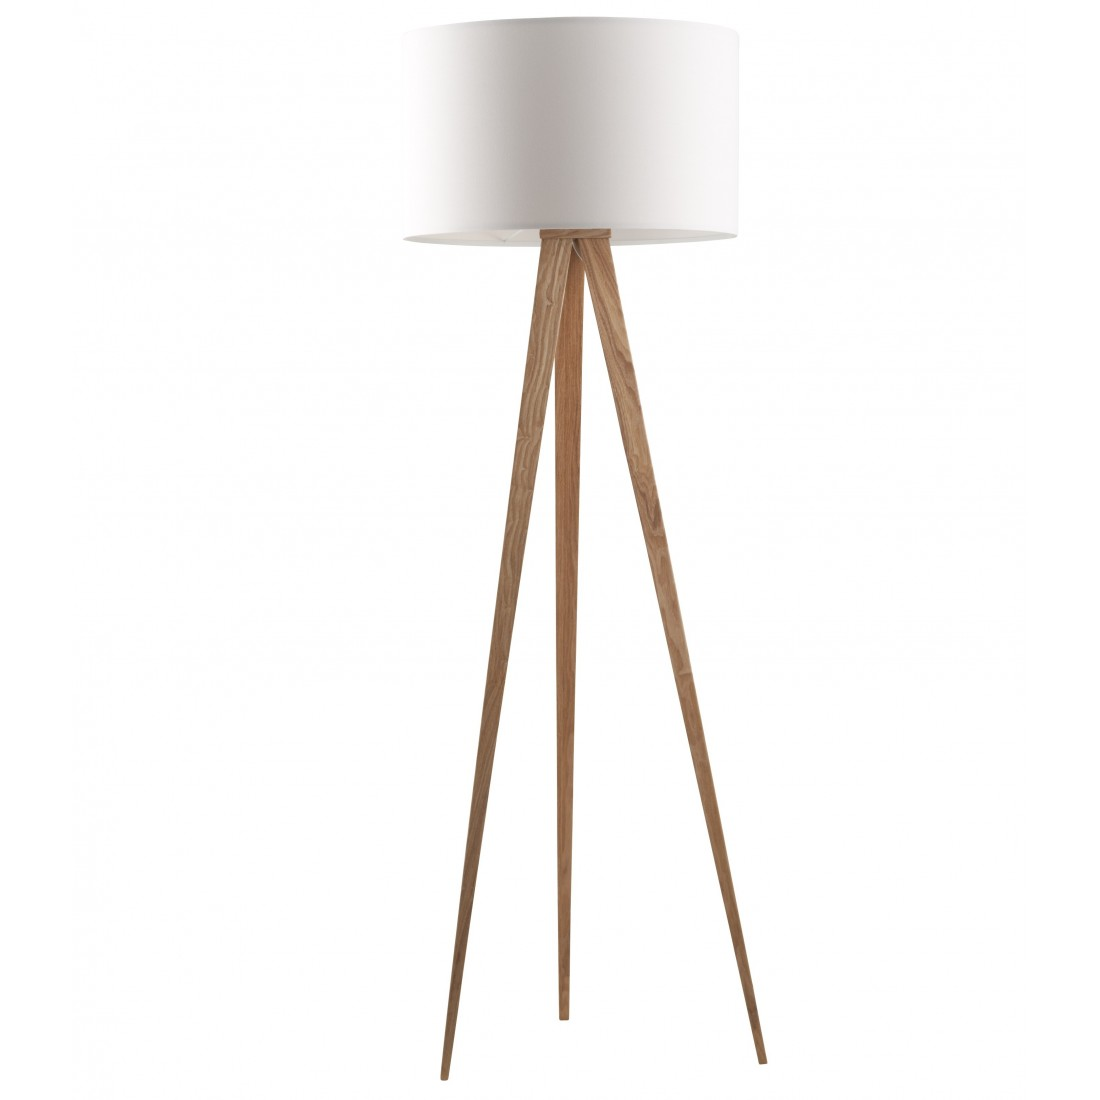 lampadaire tr pied tripod wood white blanc pieds bois. Black Bedroom Furniture Sets. Home Design Ideas